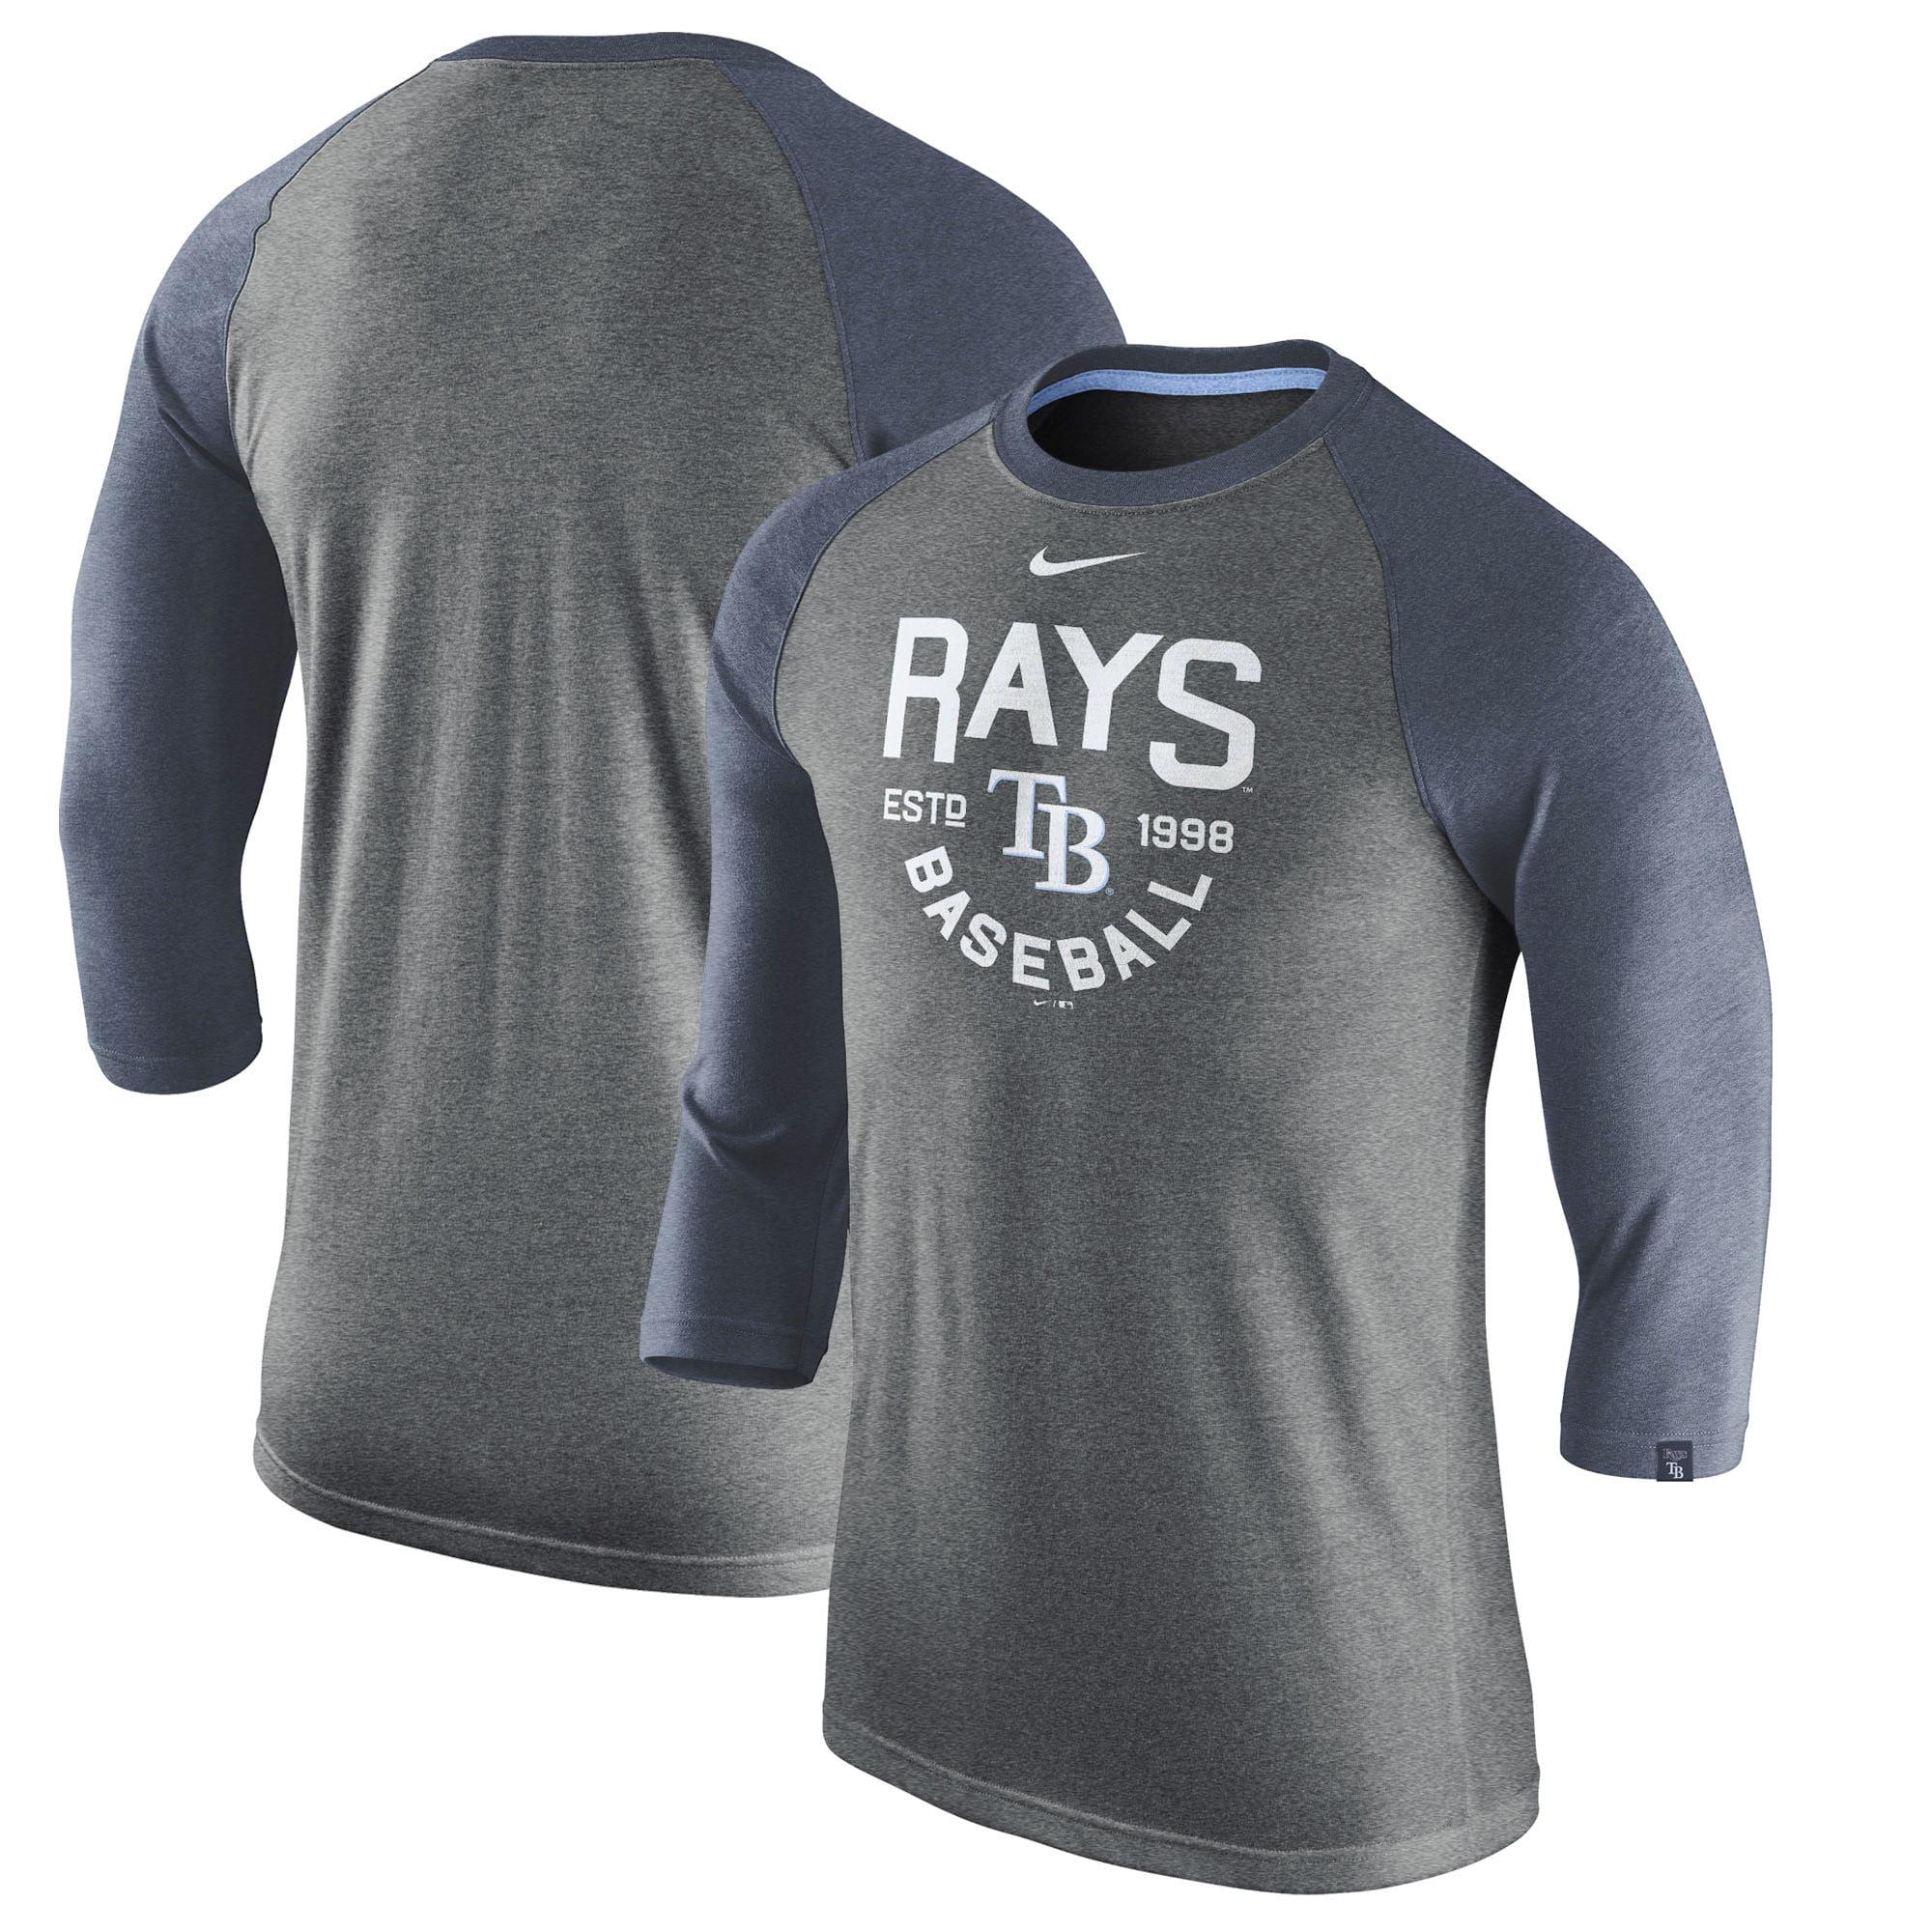 Tampa Bay Rays Nike Tri-Blend 3/4-Sleeve Raglan T-Shirt - Heathered Charcoal